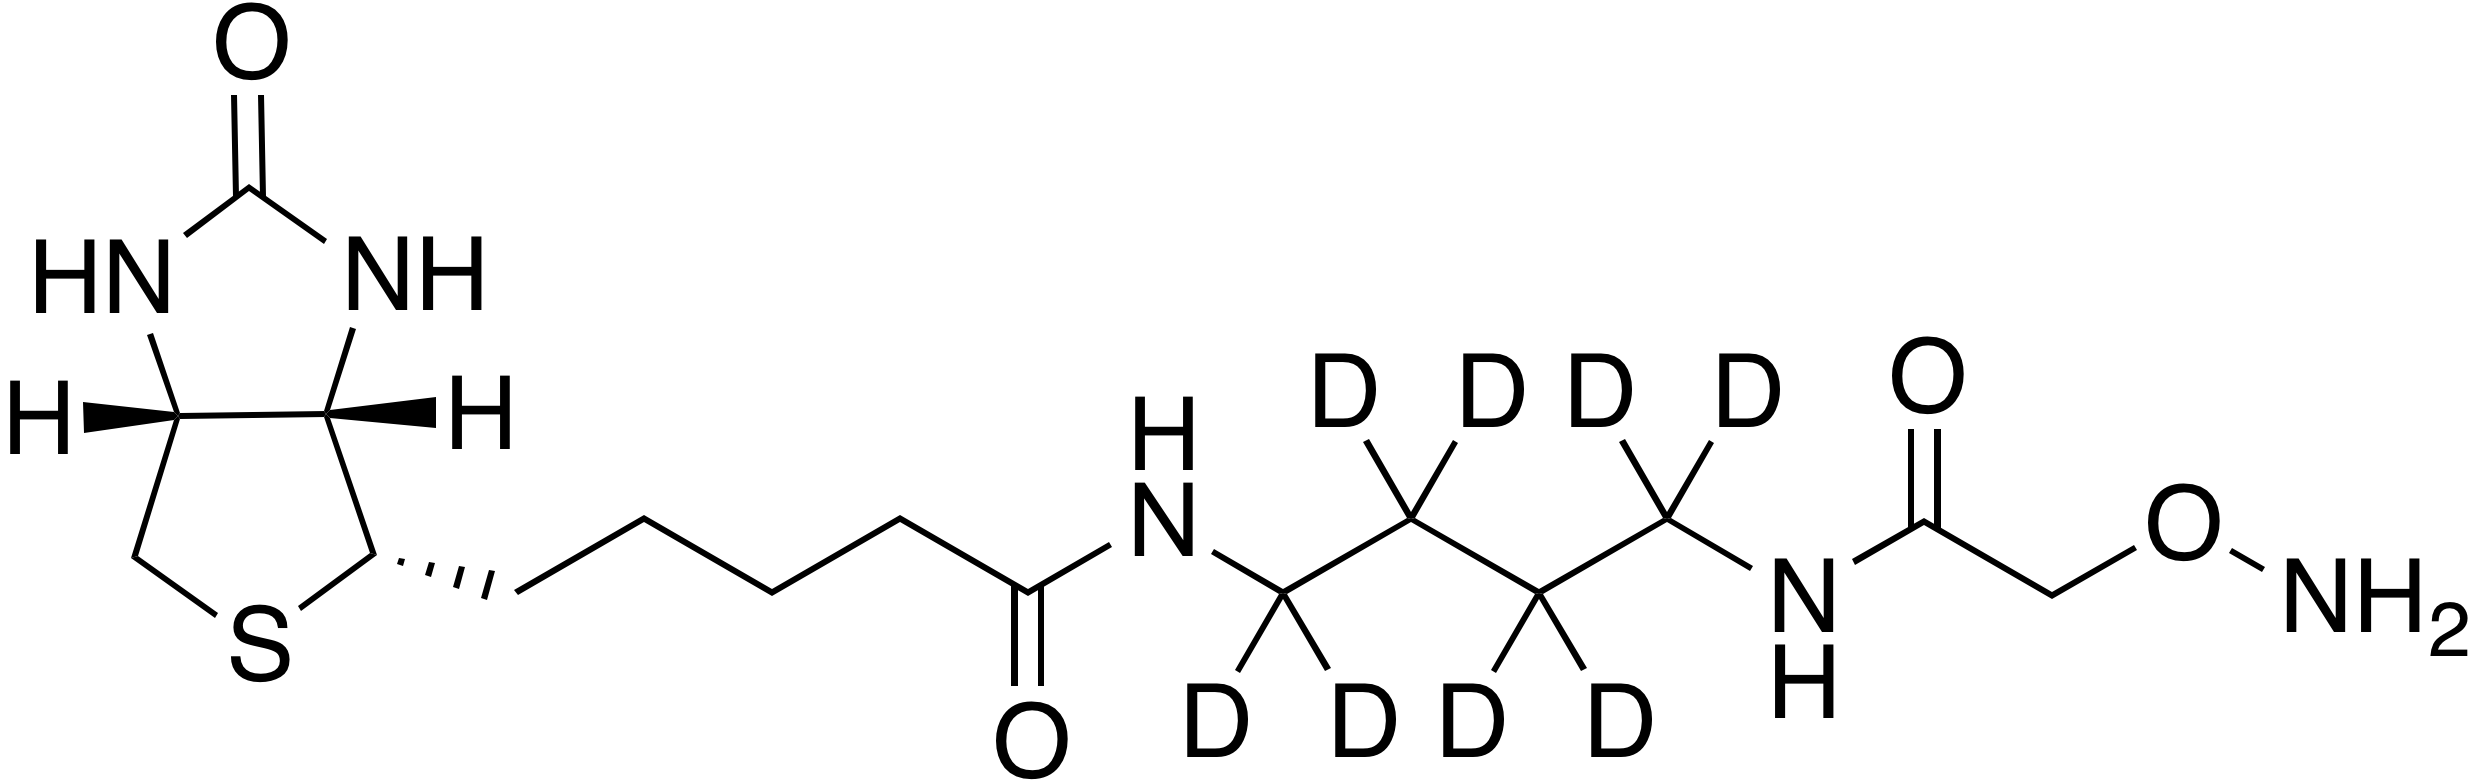 N-(4-Aminooxyacetamidobutyl-d<sub>8</sub>)-biotinamide